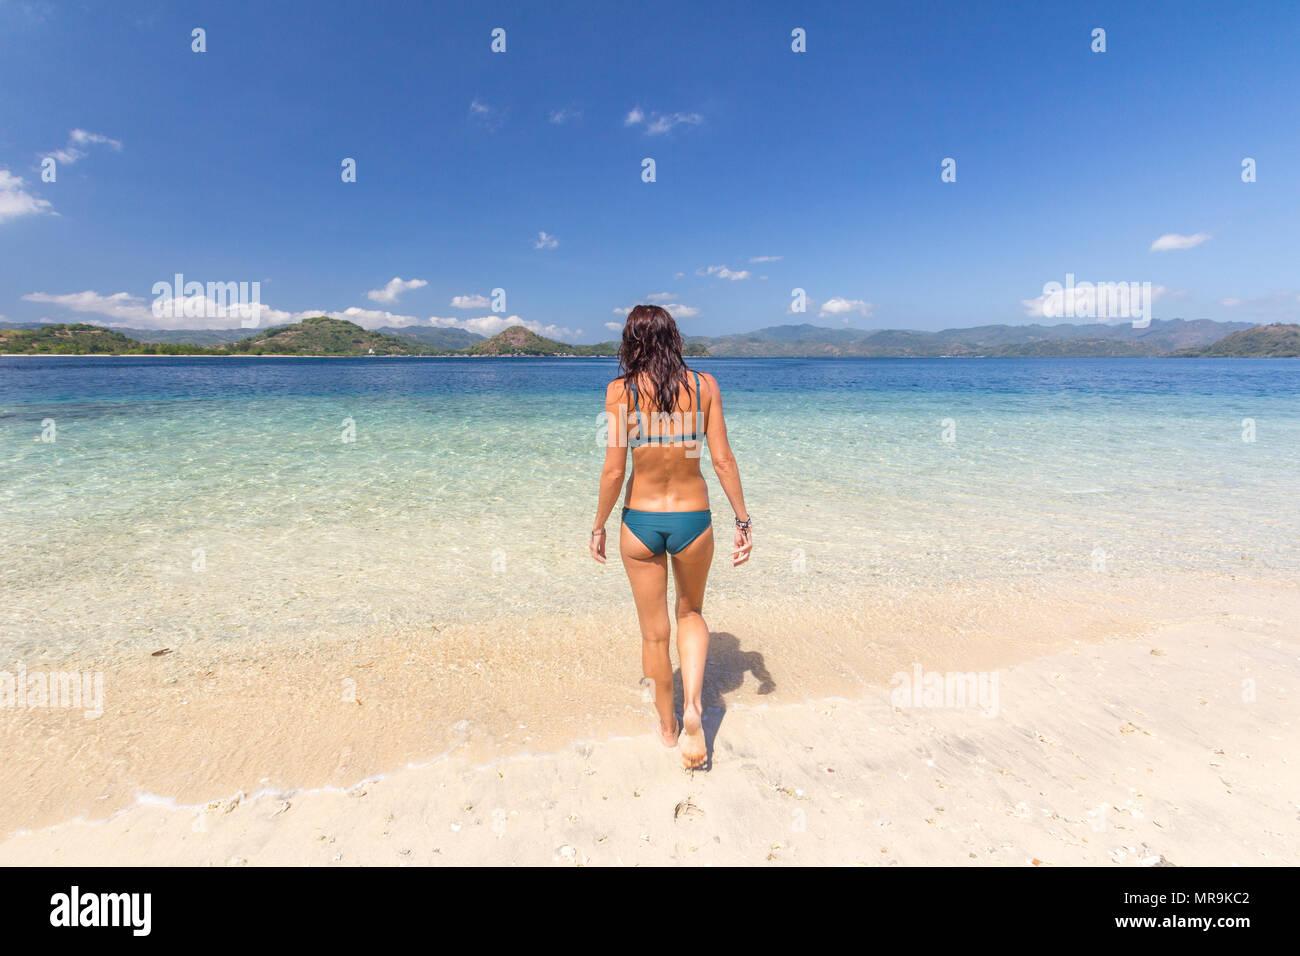 Chica en la playa, en la isla de Gili Lombok Imagen De Stock